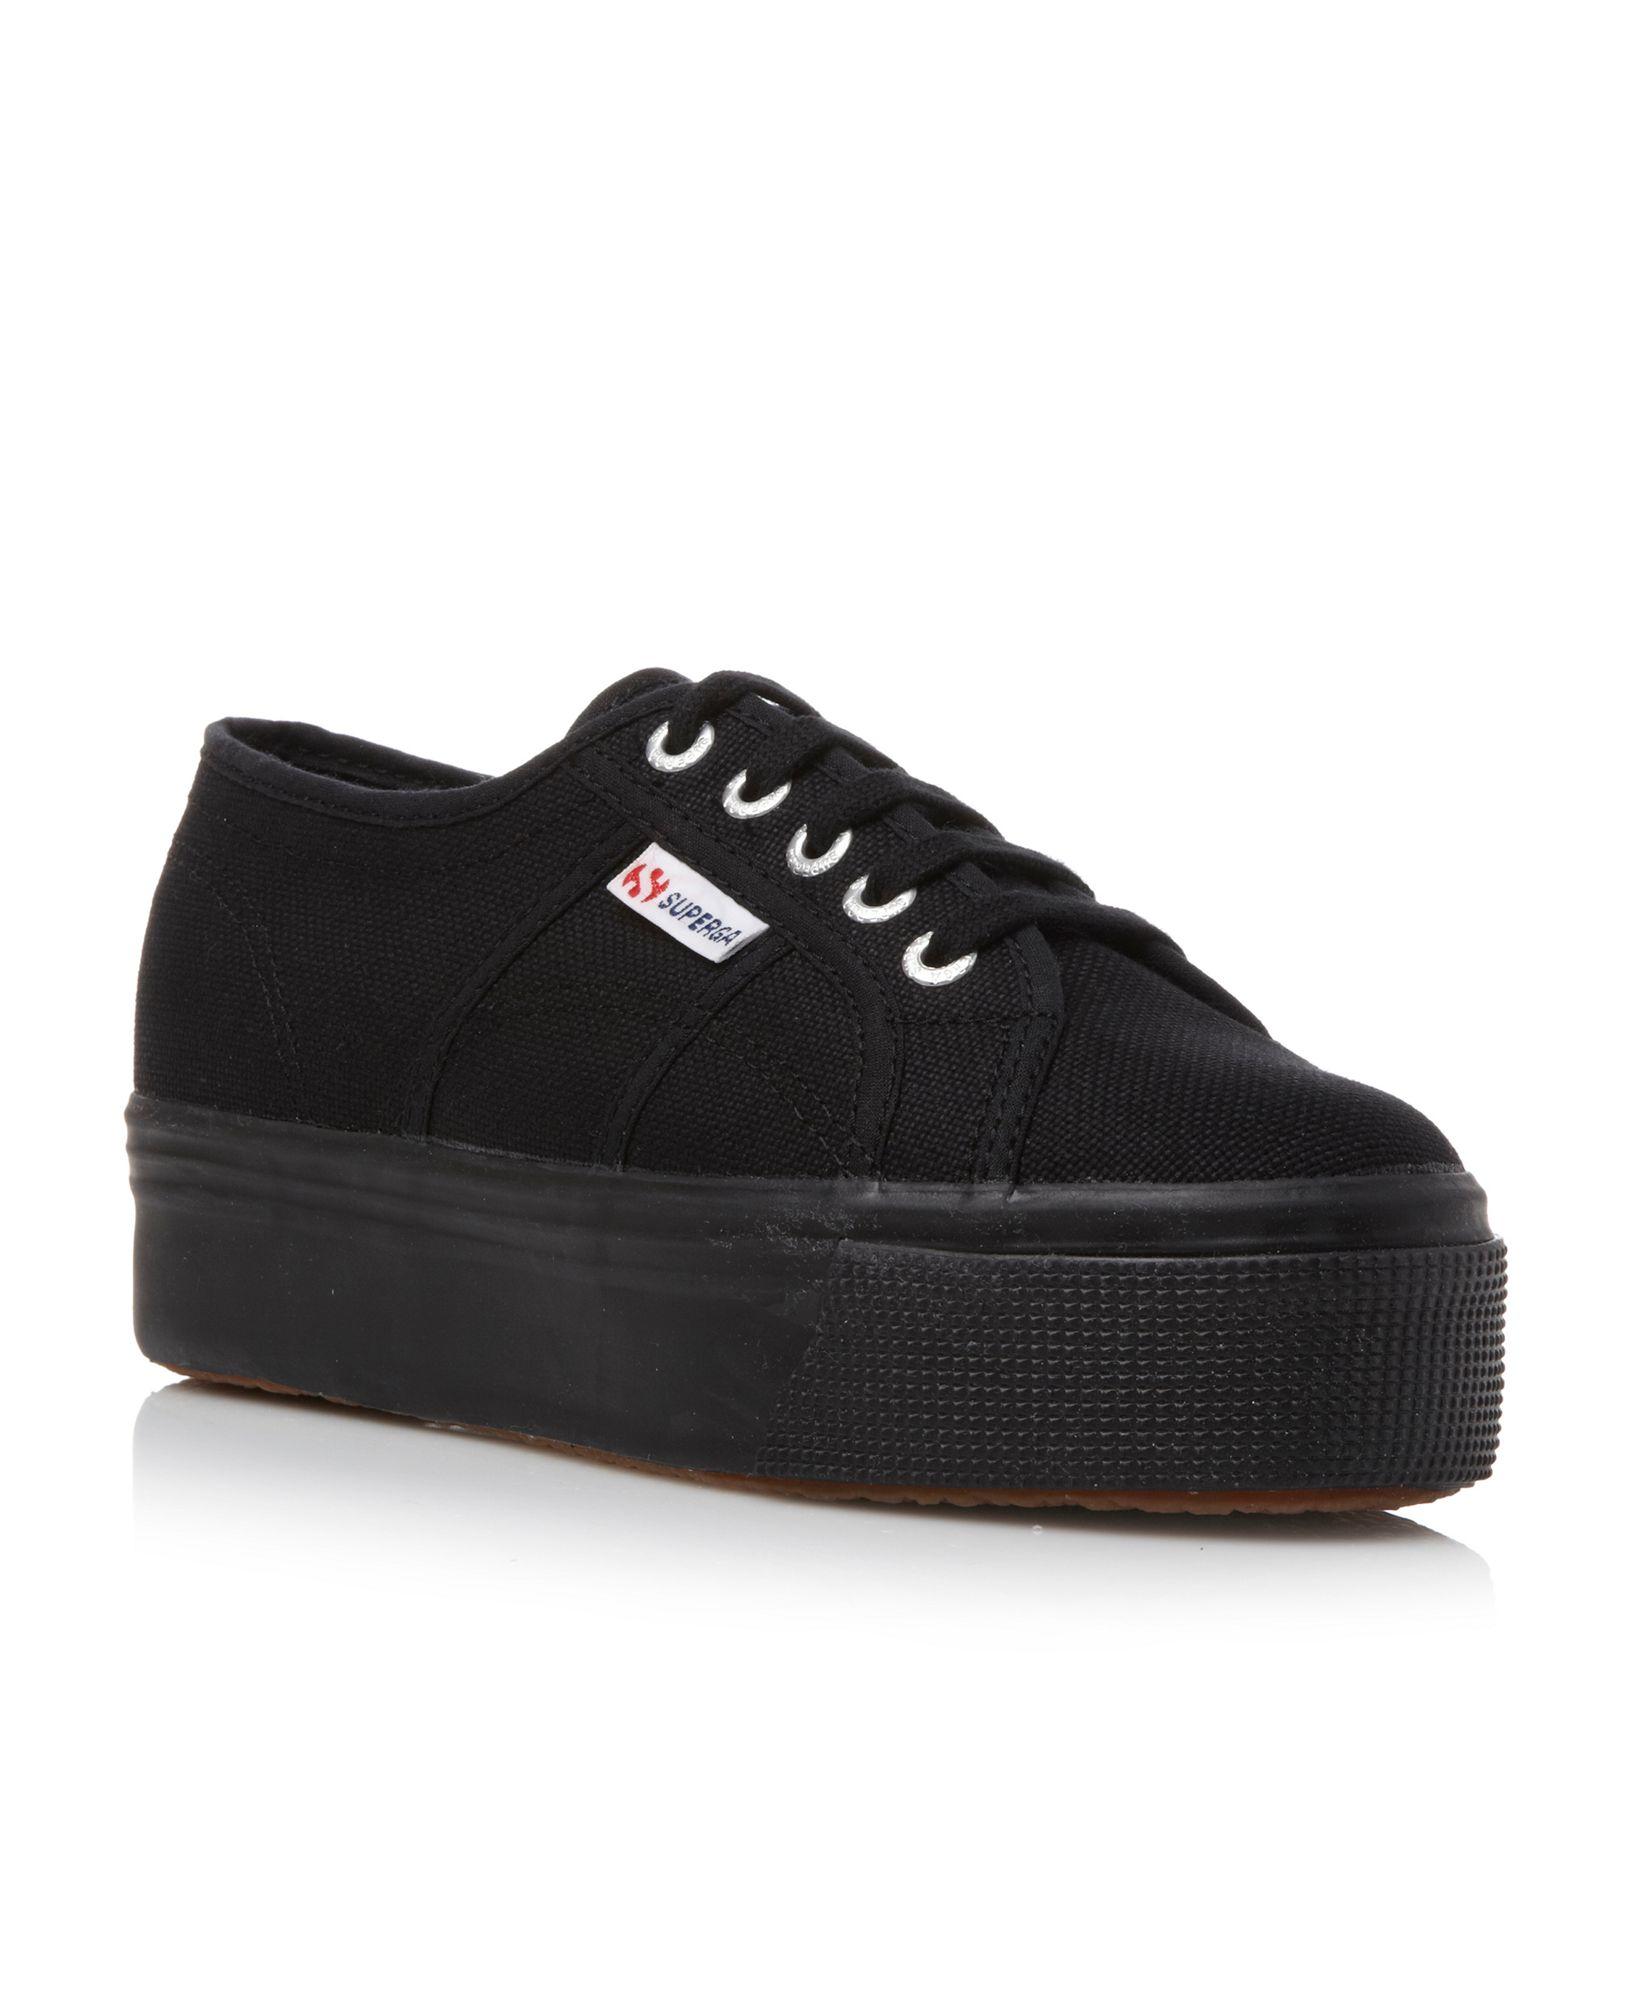 superga flatform lace up shoes in black lyst